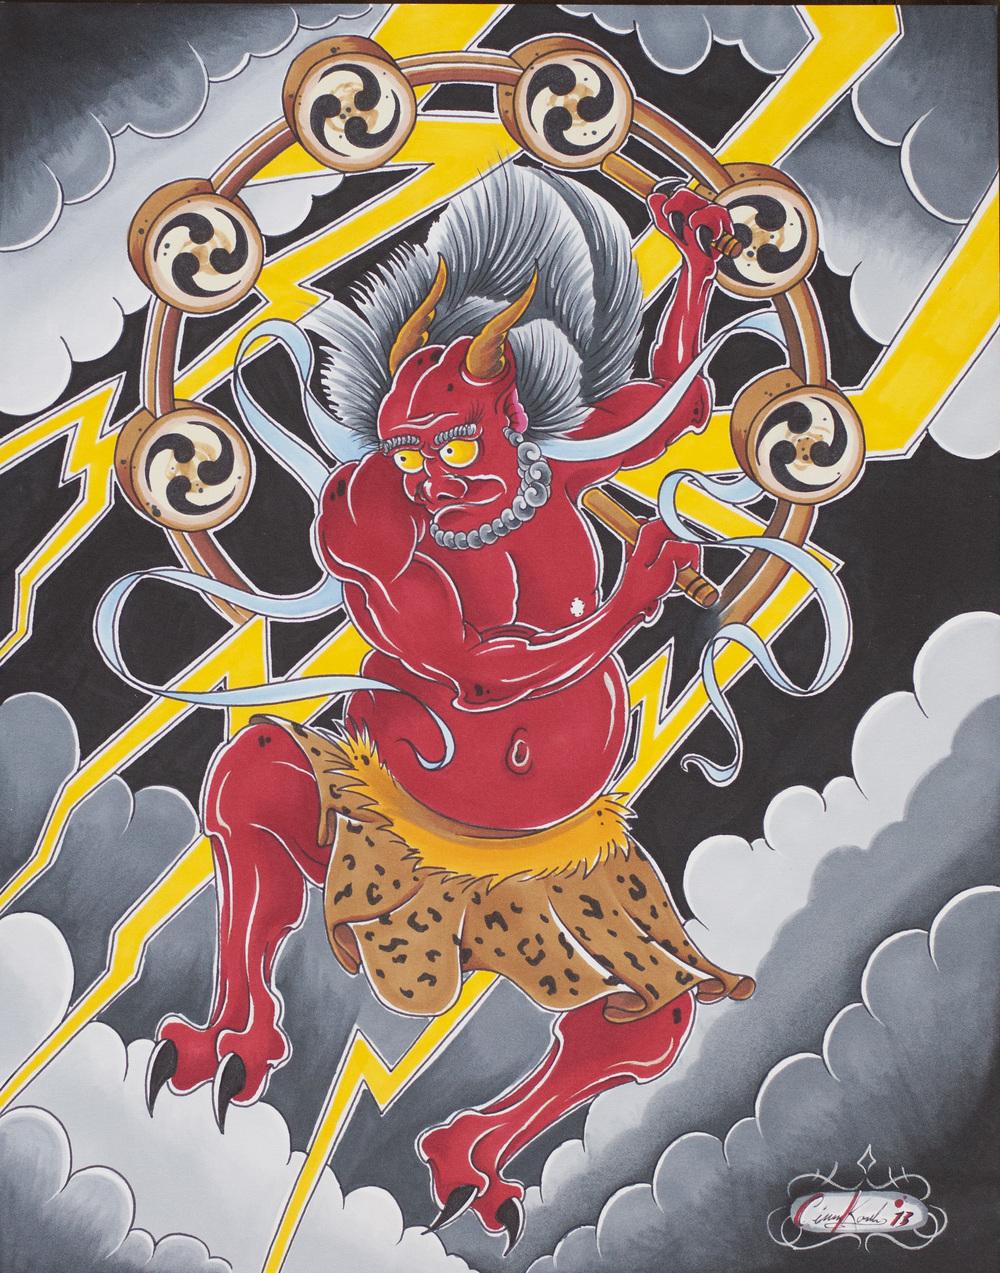 Raijin God Of Thunder Ciaran Korb Arts His name is derived from the japanese words rai (meaning thunder) and shin (god). raijin god of thunder ciaran korb arts